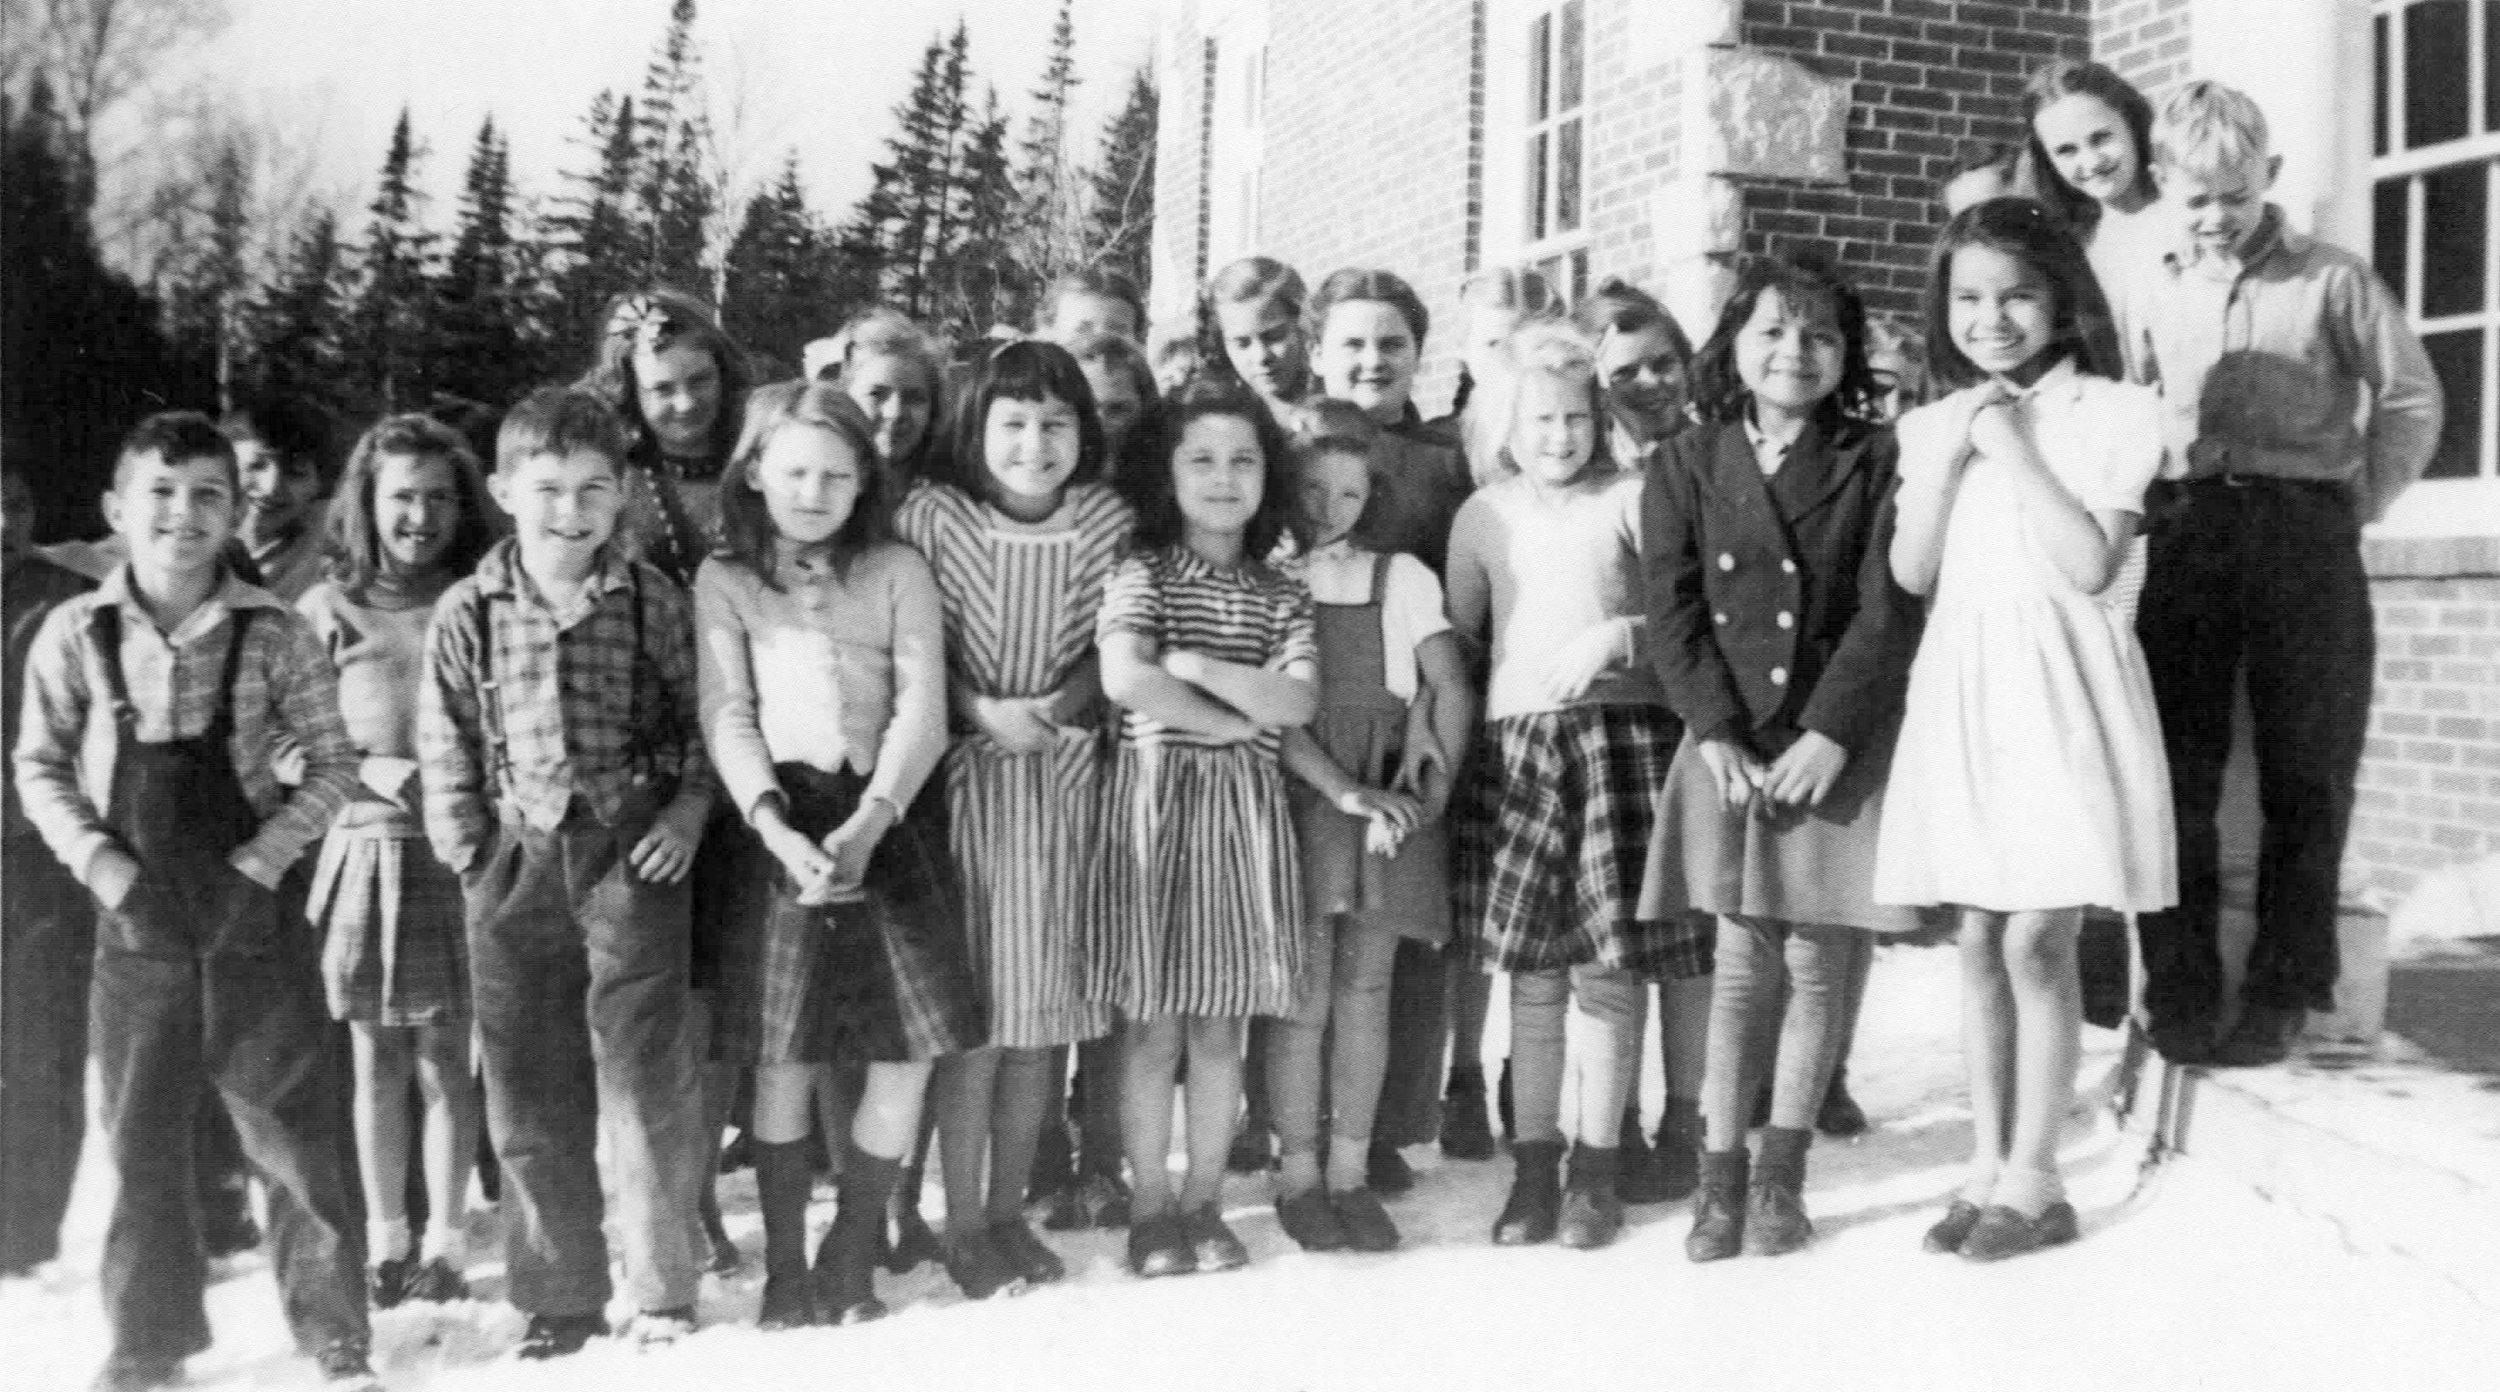 1942 Class Photo - Front Row L-R_____?, John Eseltine, Dorothy Huffman, Ann Causley, Loretta Mongene, Judy McDonald, Ruth Fenlon, Mary Andrews, Margie AndrewsBack Rows L-R_____?, _____?, Jessie Burlew, Helen Lindberg, _____?, _____?, Ireta Lindberg, Dorothy Windsor, Cleo Pope, _____?, _____?, Martina Mertaugh, Billy Walker